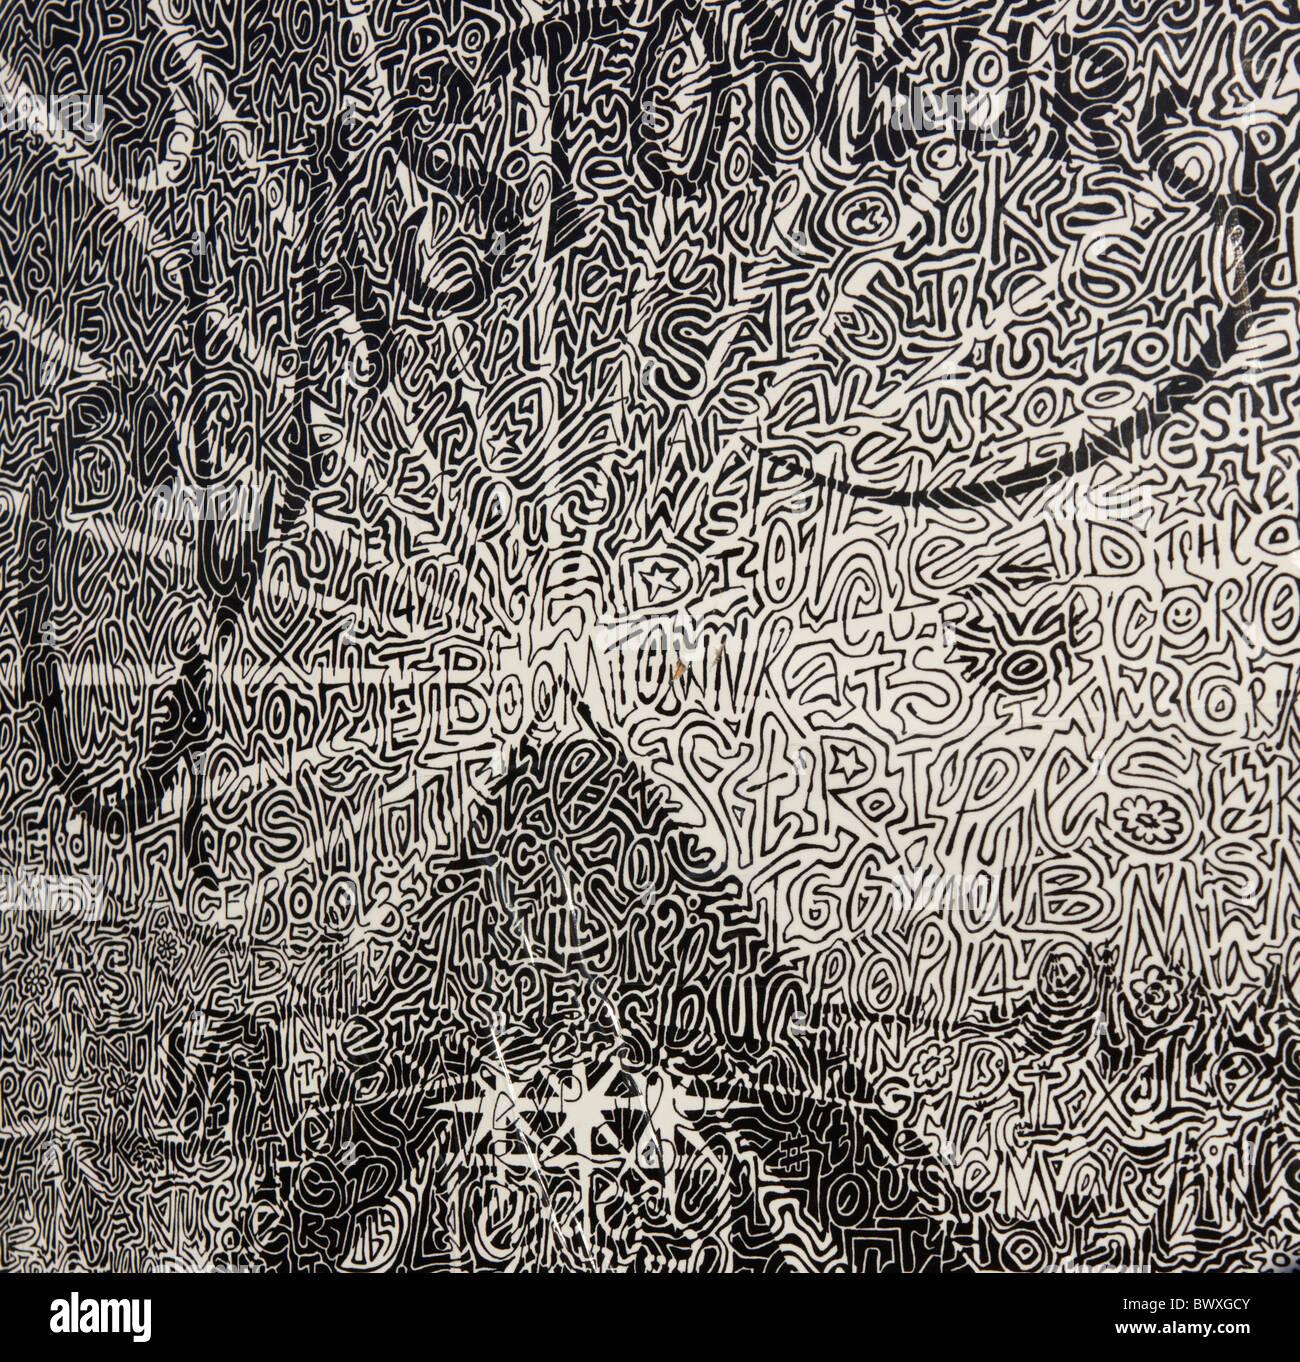 Graphic Art At The Glastonbury Festival Somerset UK Europe - Stock Image